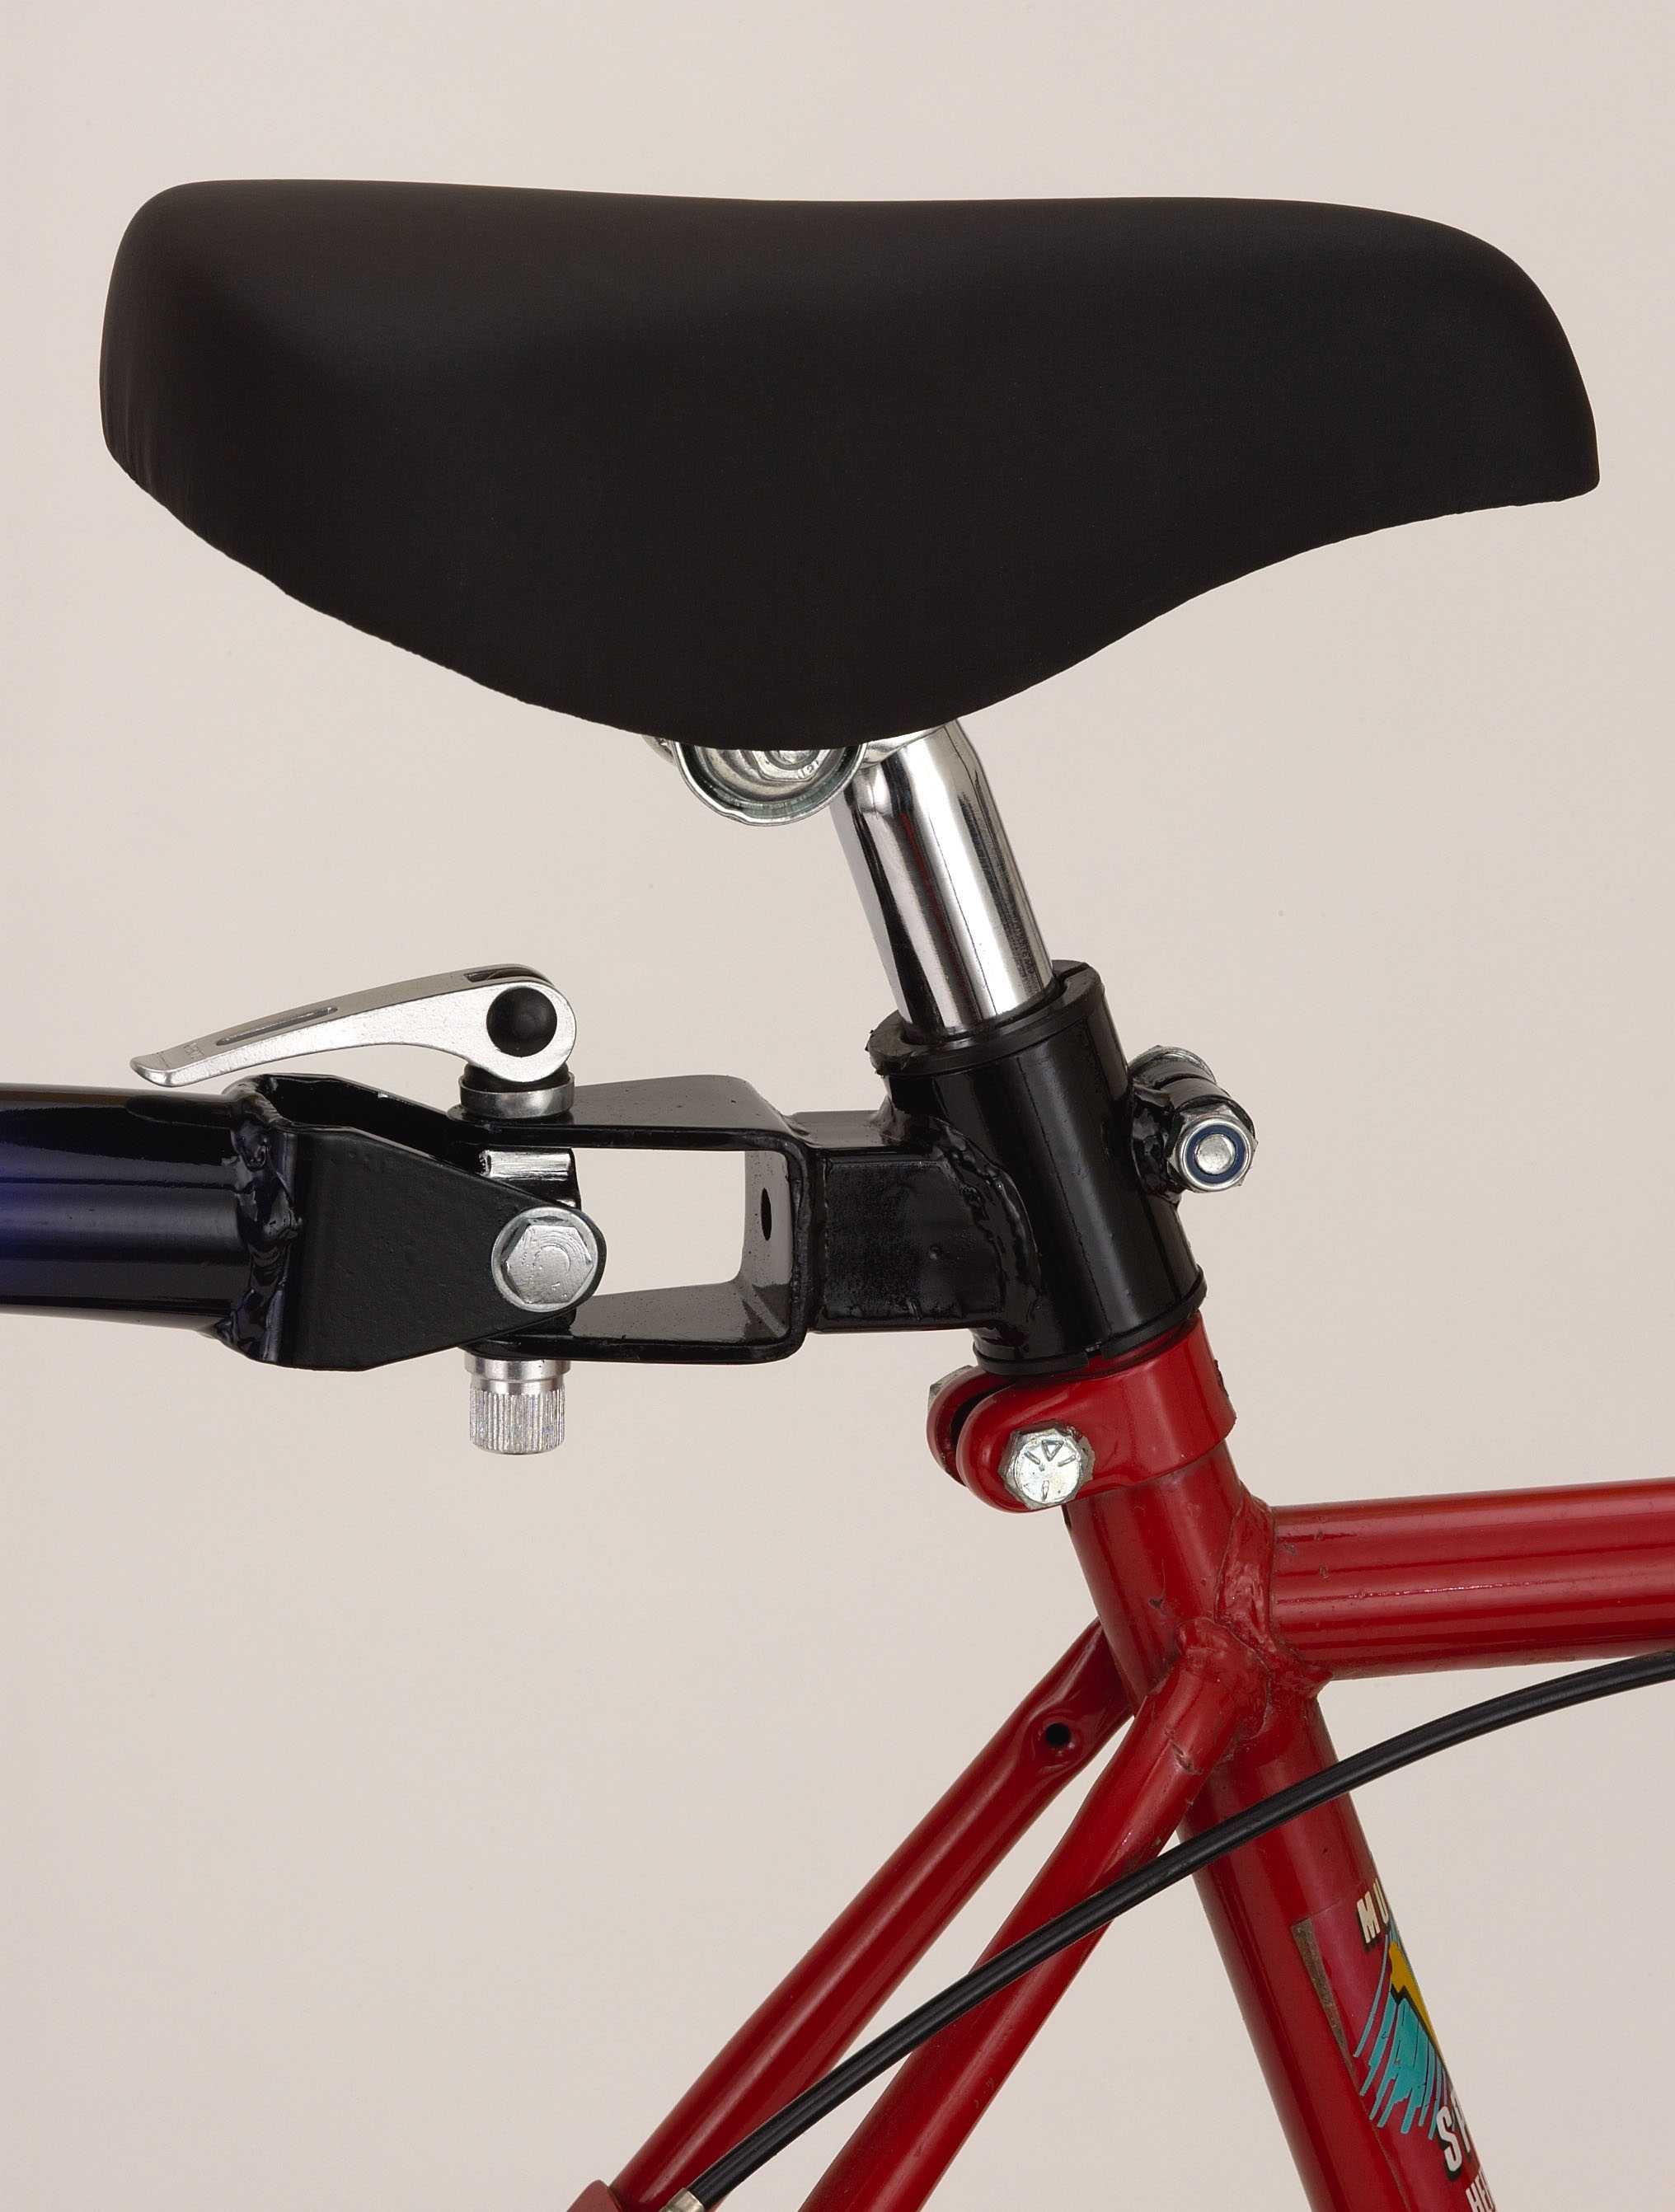 Cpsc Instep Llc Announce Recall Of Trailer Bikes Cpscgov